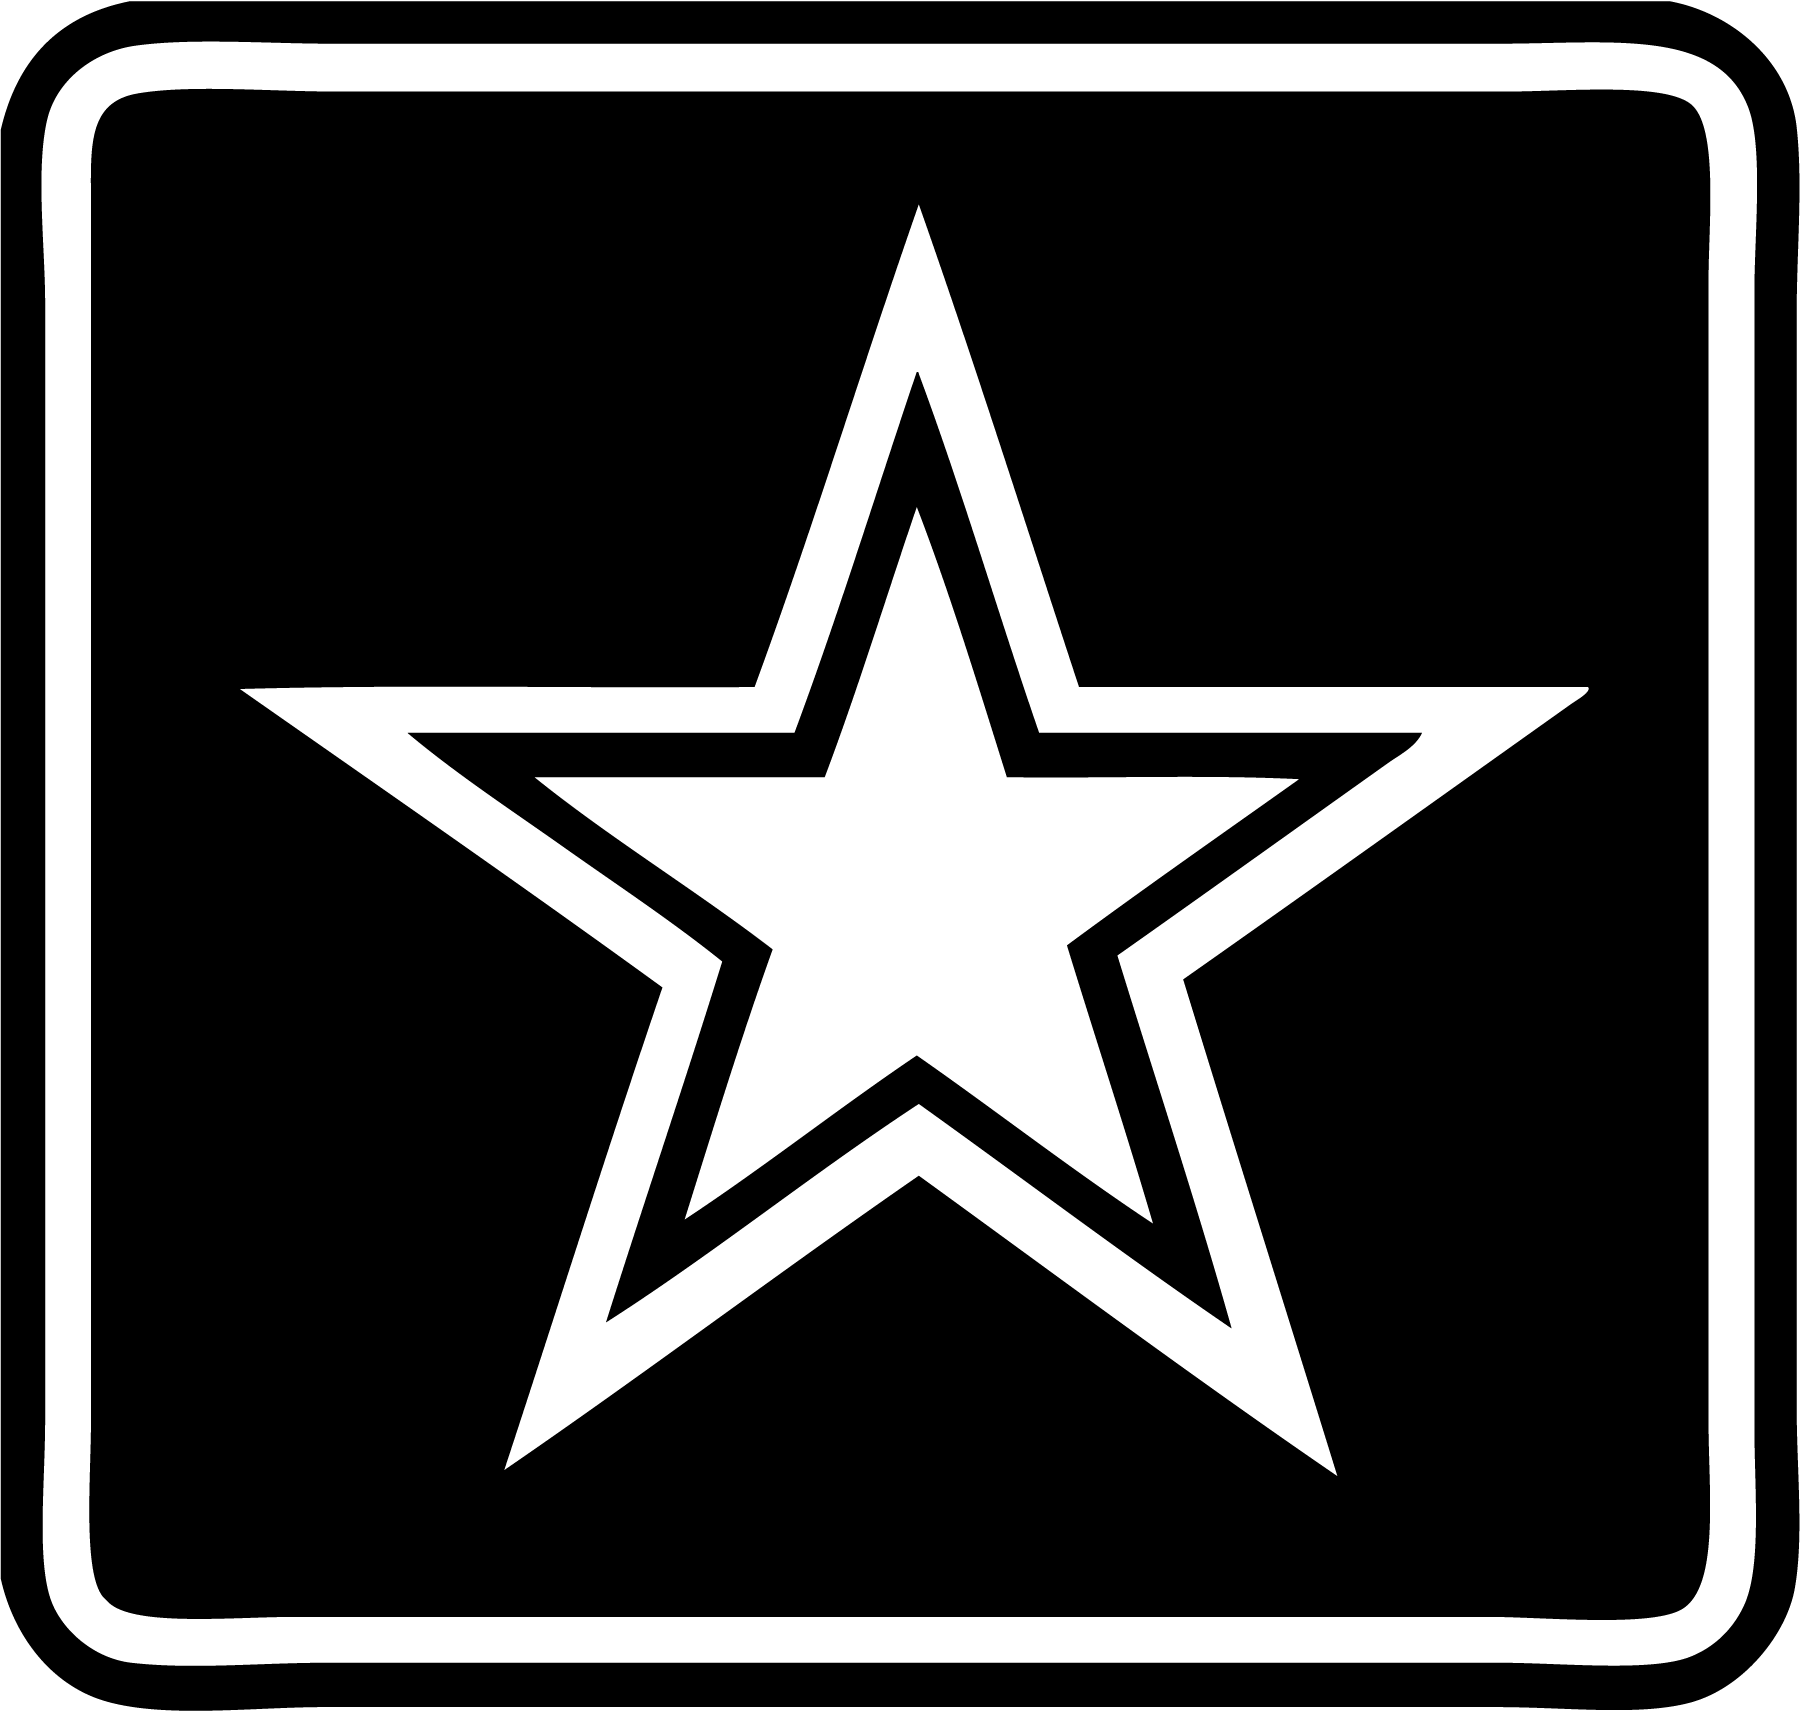 Us army logo vector. Navy clipart insignia